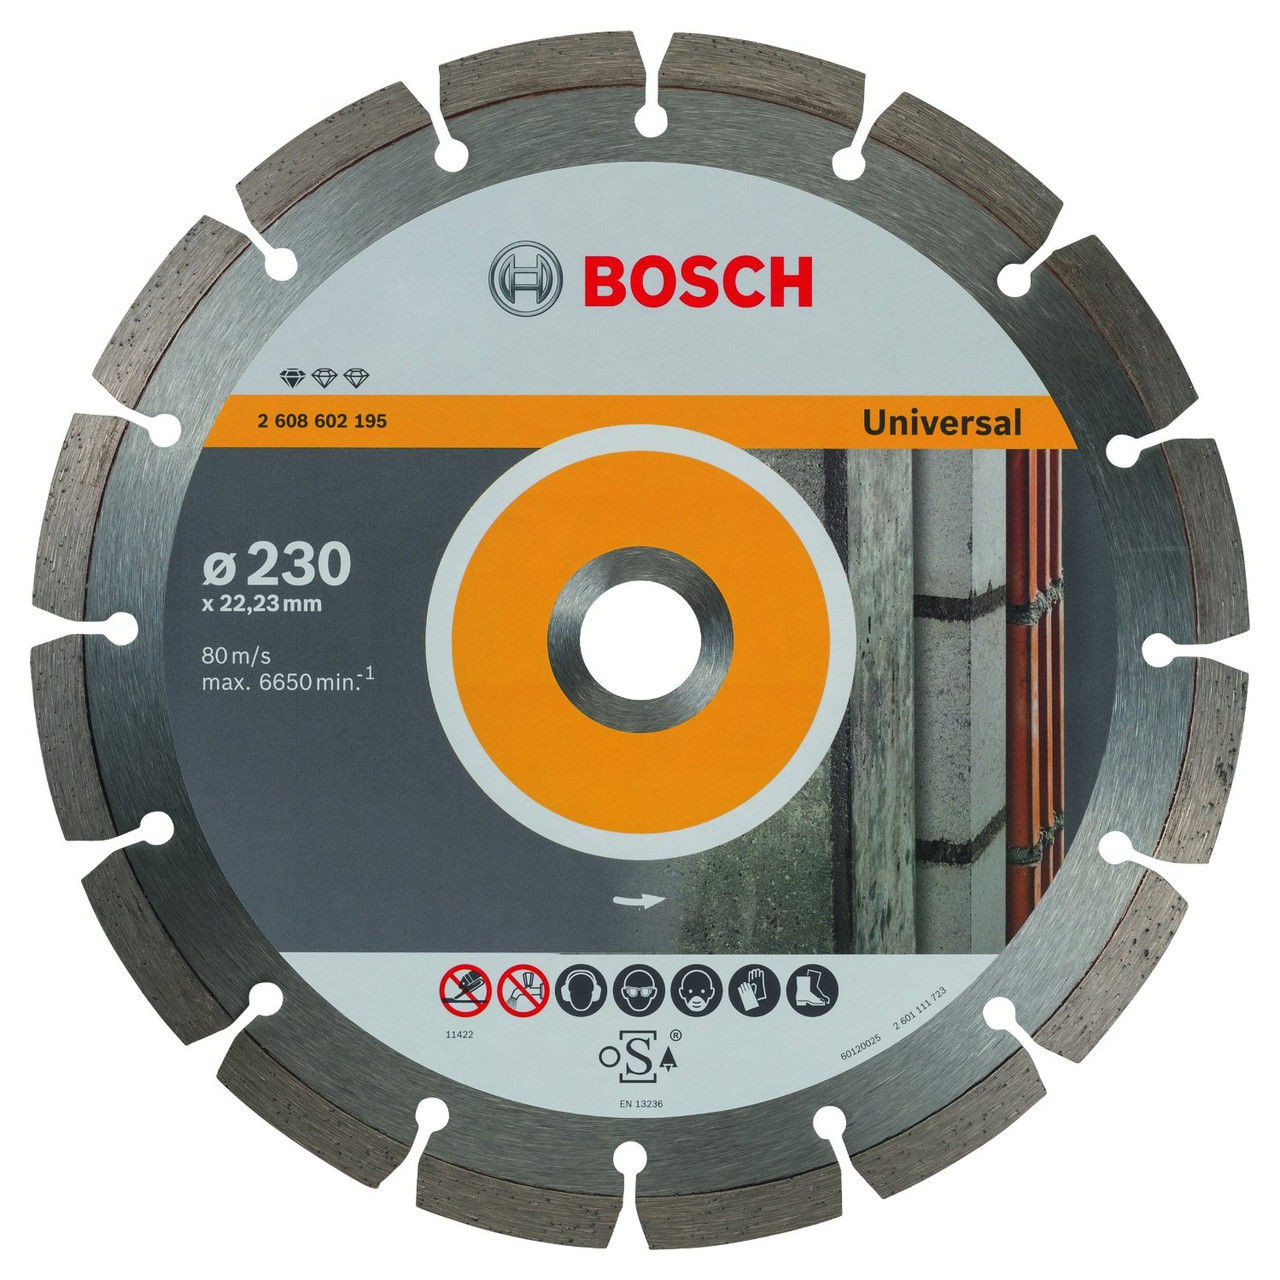 (2608602195) Алмазный диск Professional for Universal230-22,23